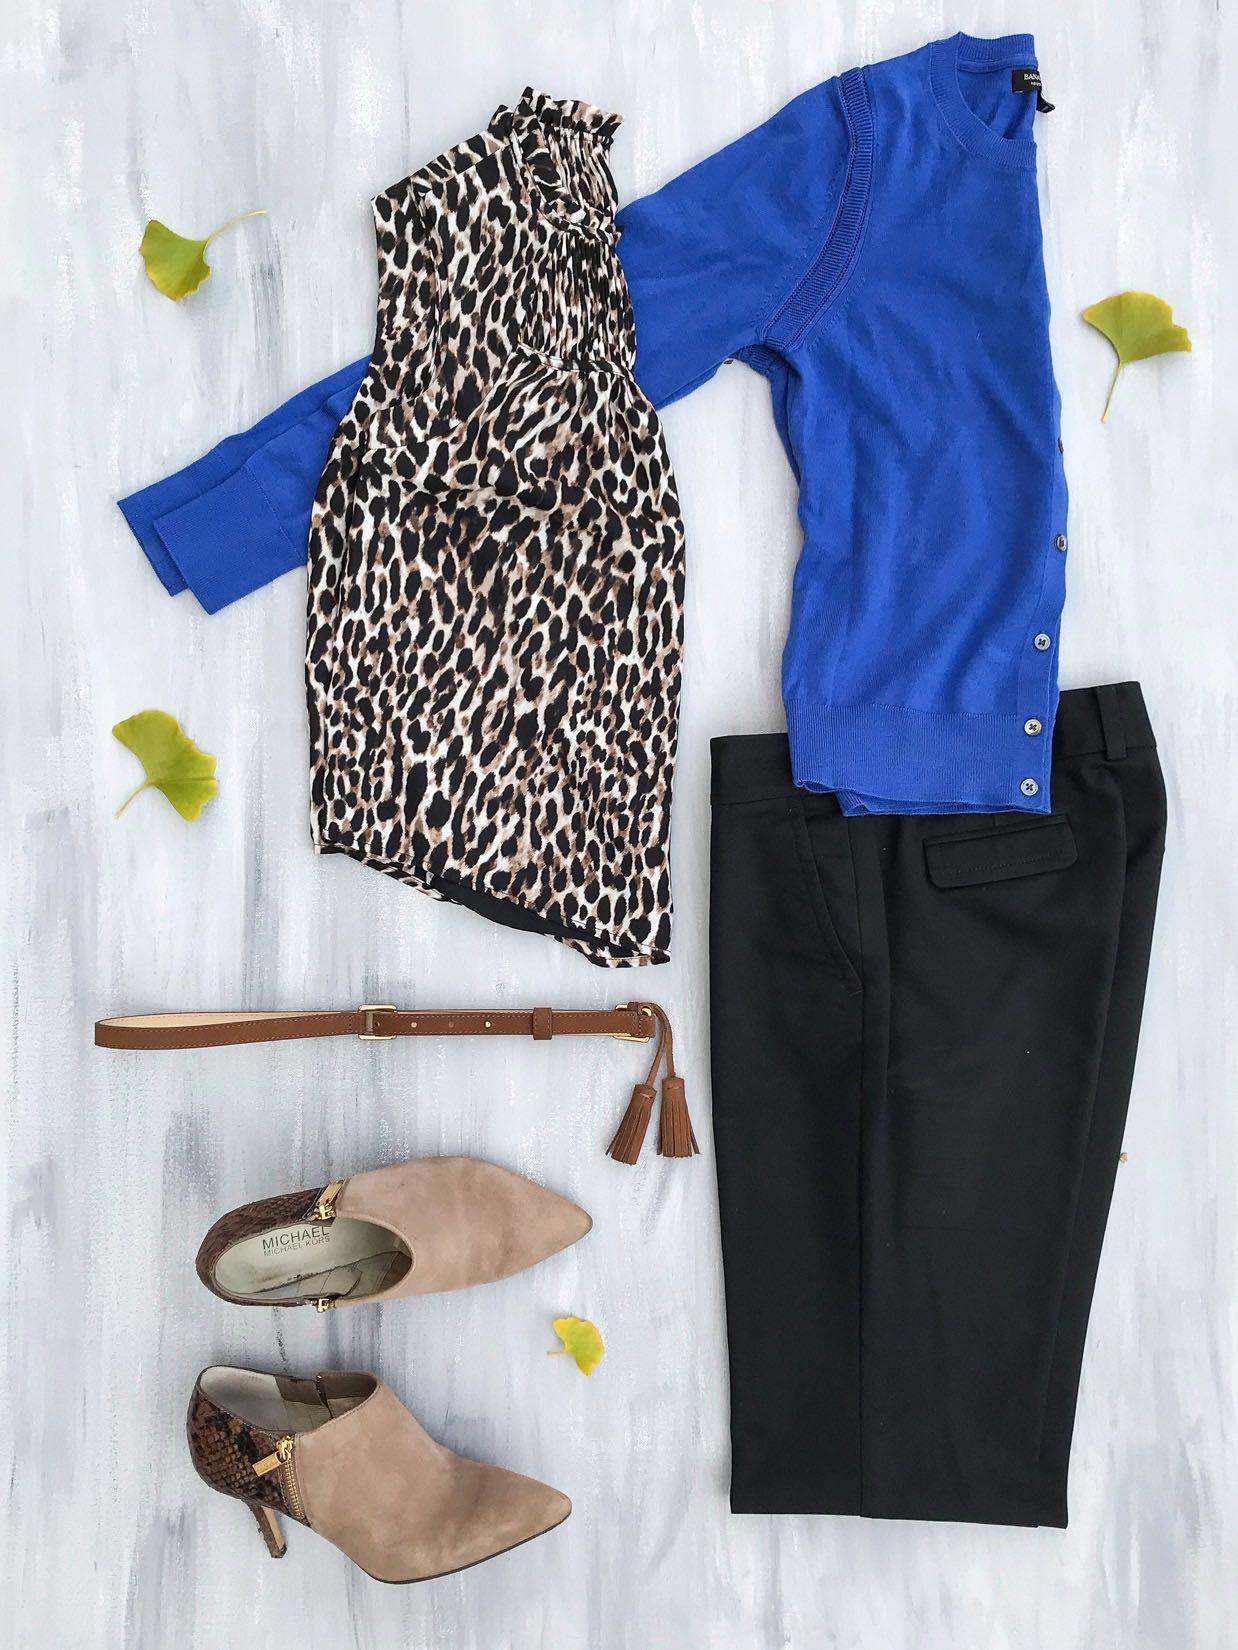 Banana Republic Silk Cashmere Cardigan, Japan Exclusive Pin-Tuck Top, black pants, tassel belt, booties.